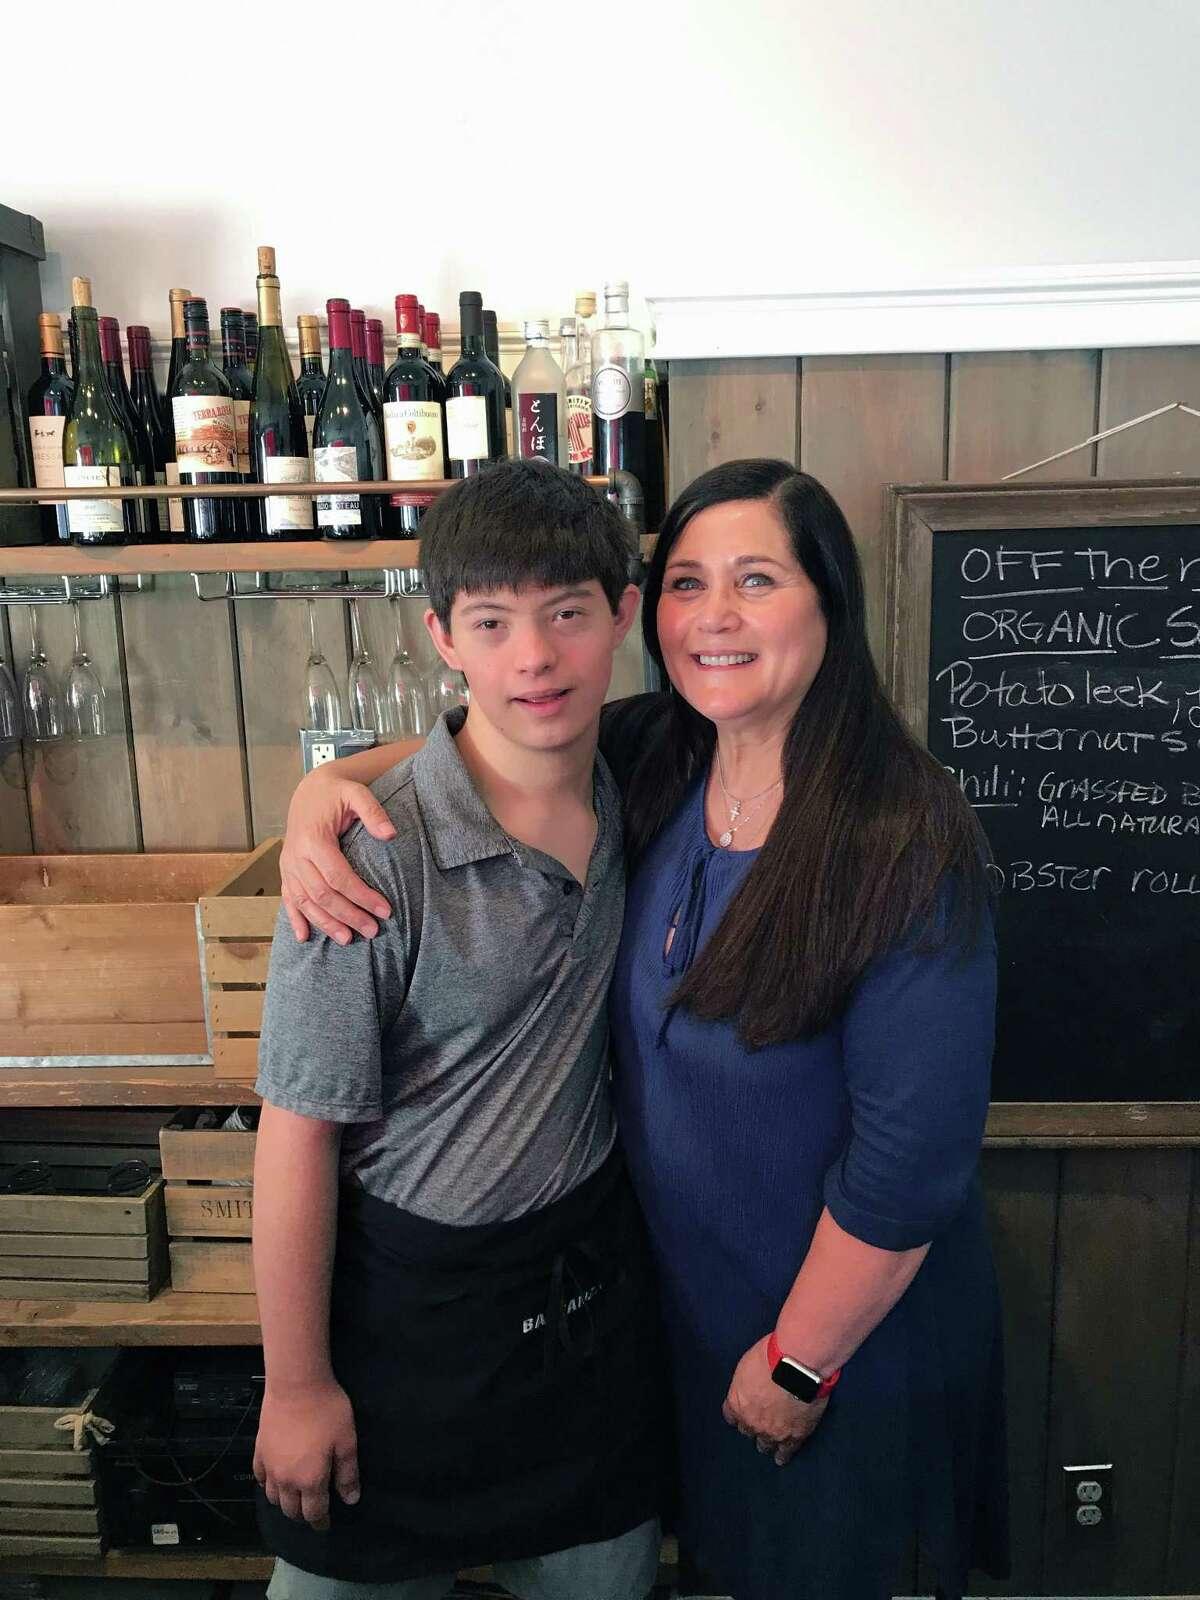 Angela Baldanza and New Canaan High School junior Patrick Dewitt, who works at Baldanza Cafe in New Canaan, Conn.